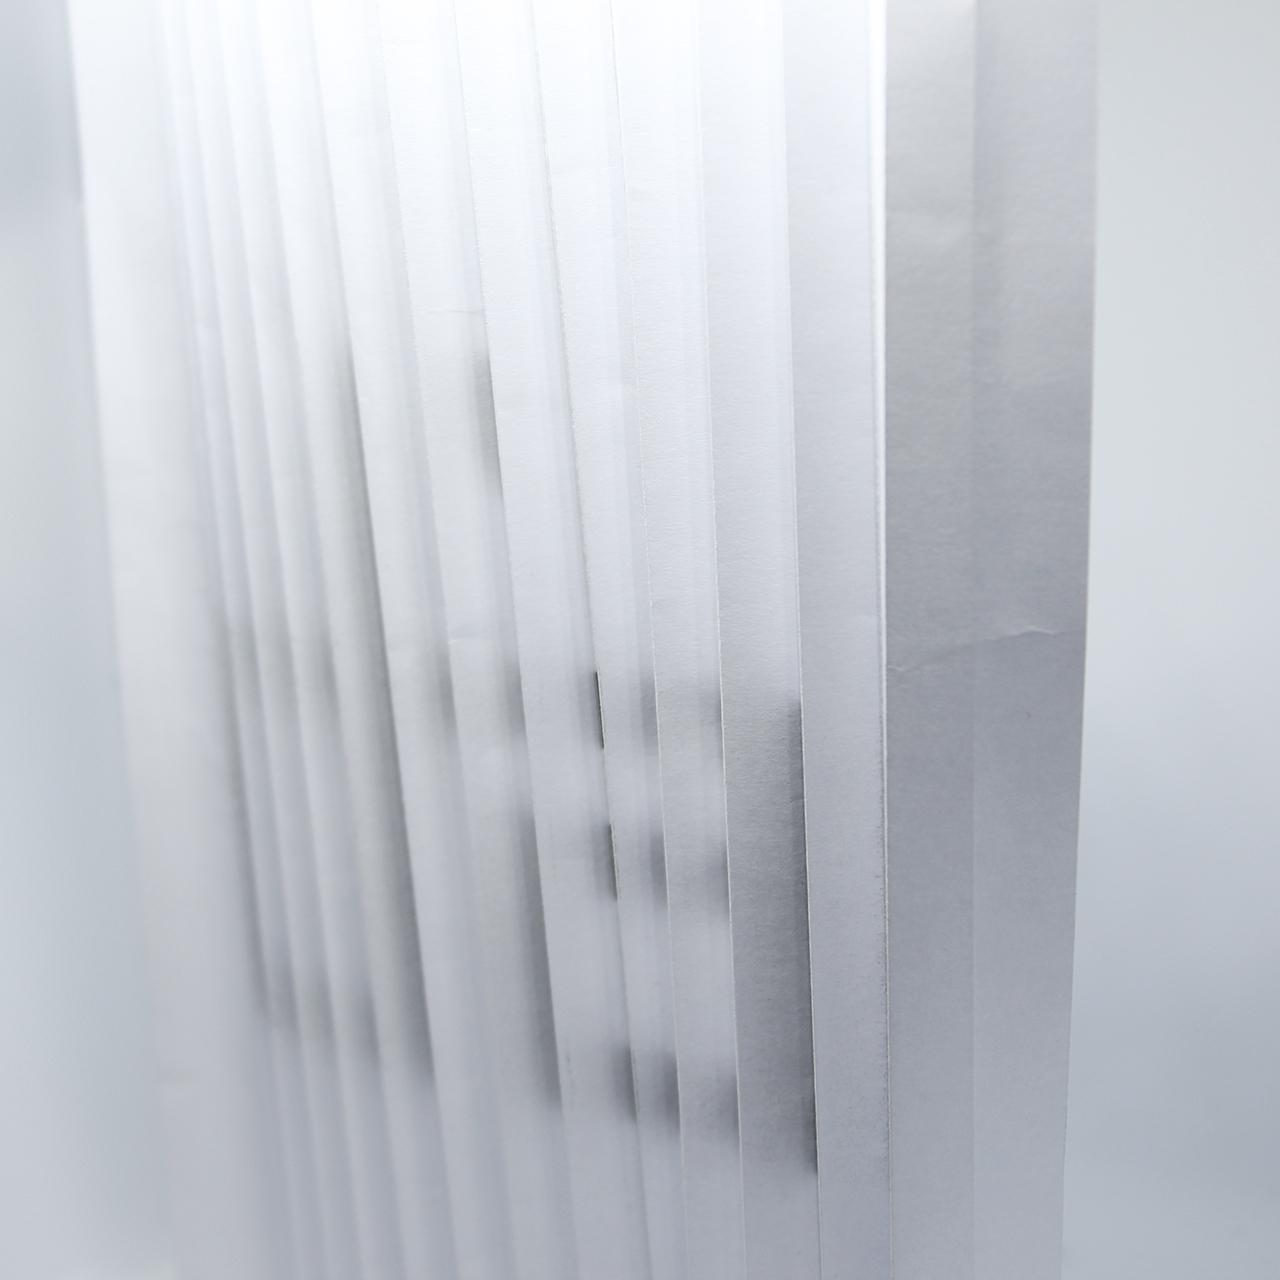 021dangeloweb - Dubitare